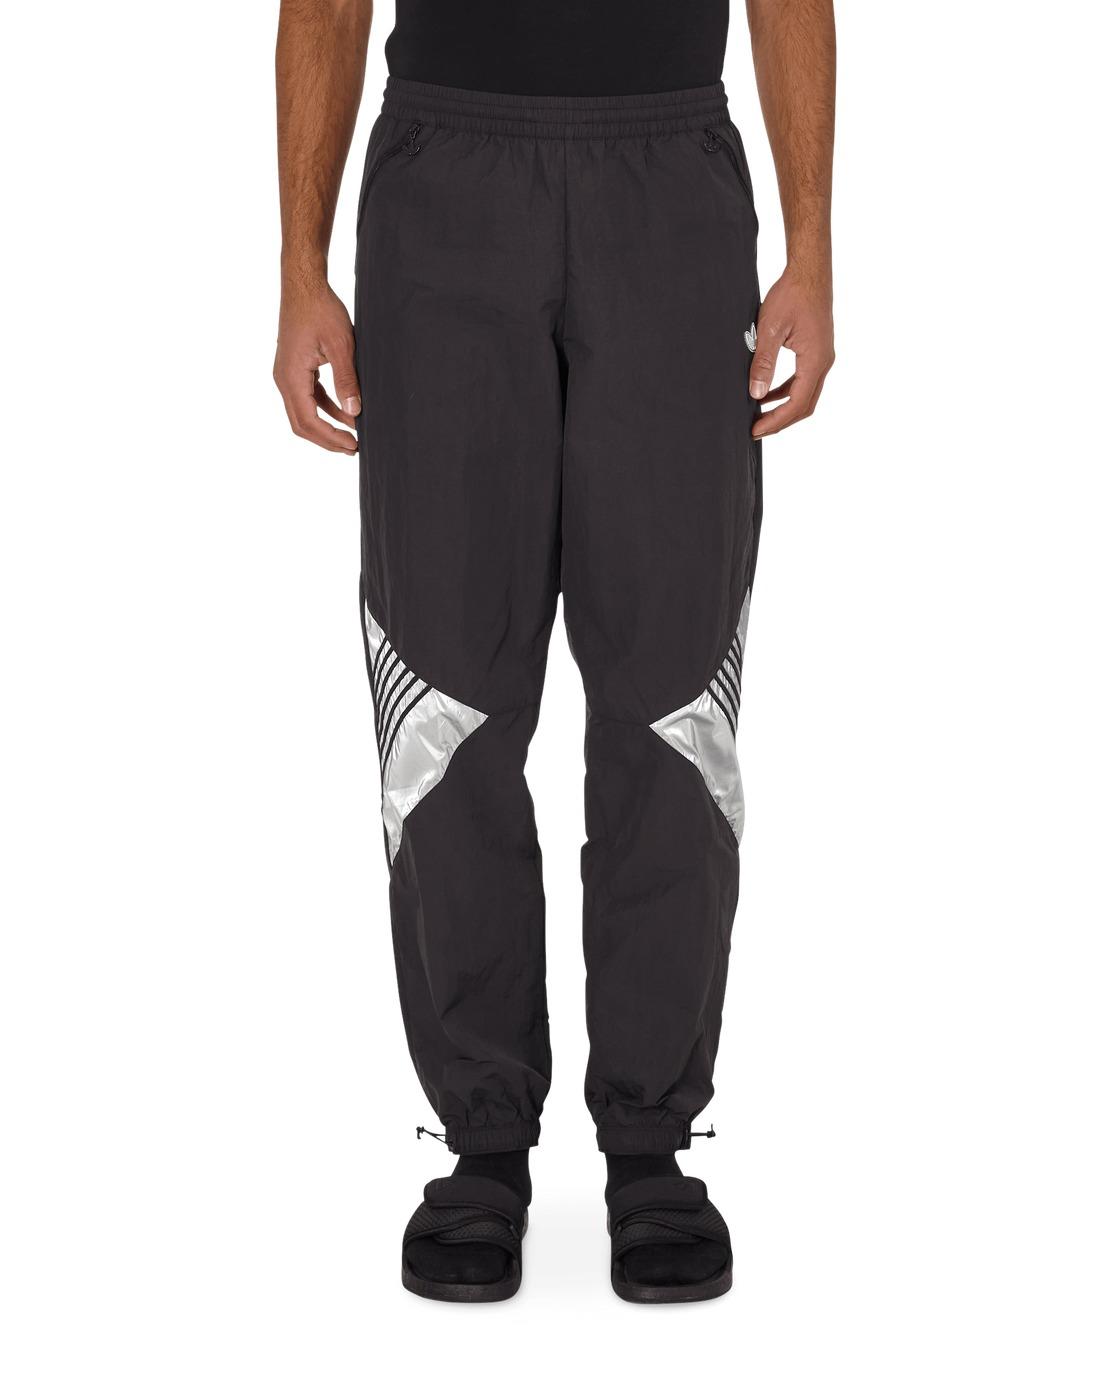 Adidas Originals Tolima 02 Track Pants Black